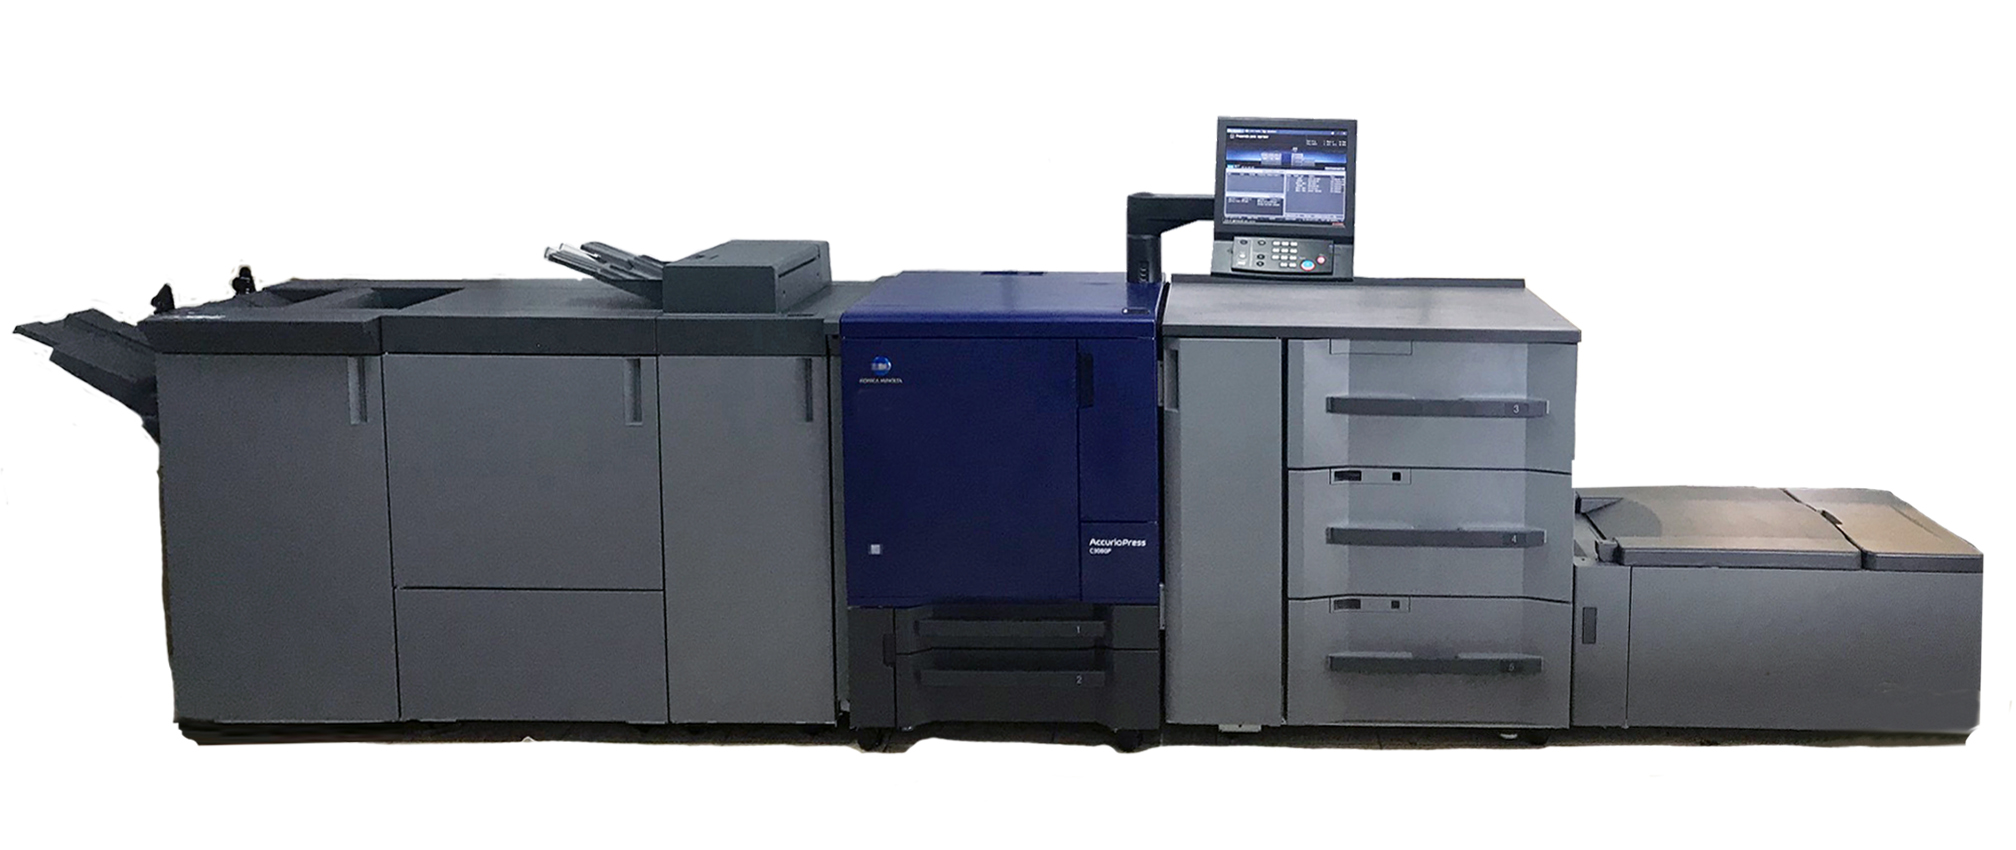 Imprenta-digital